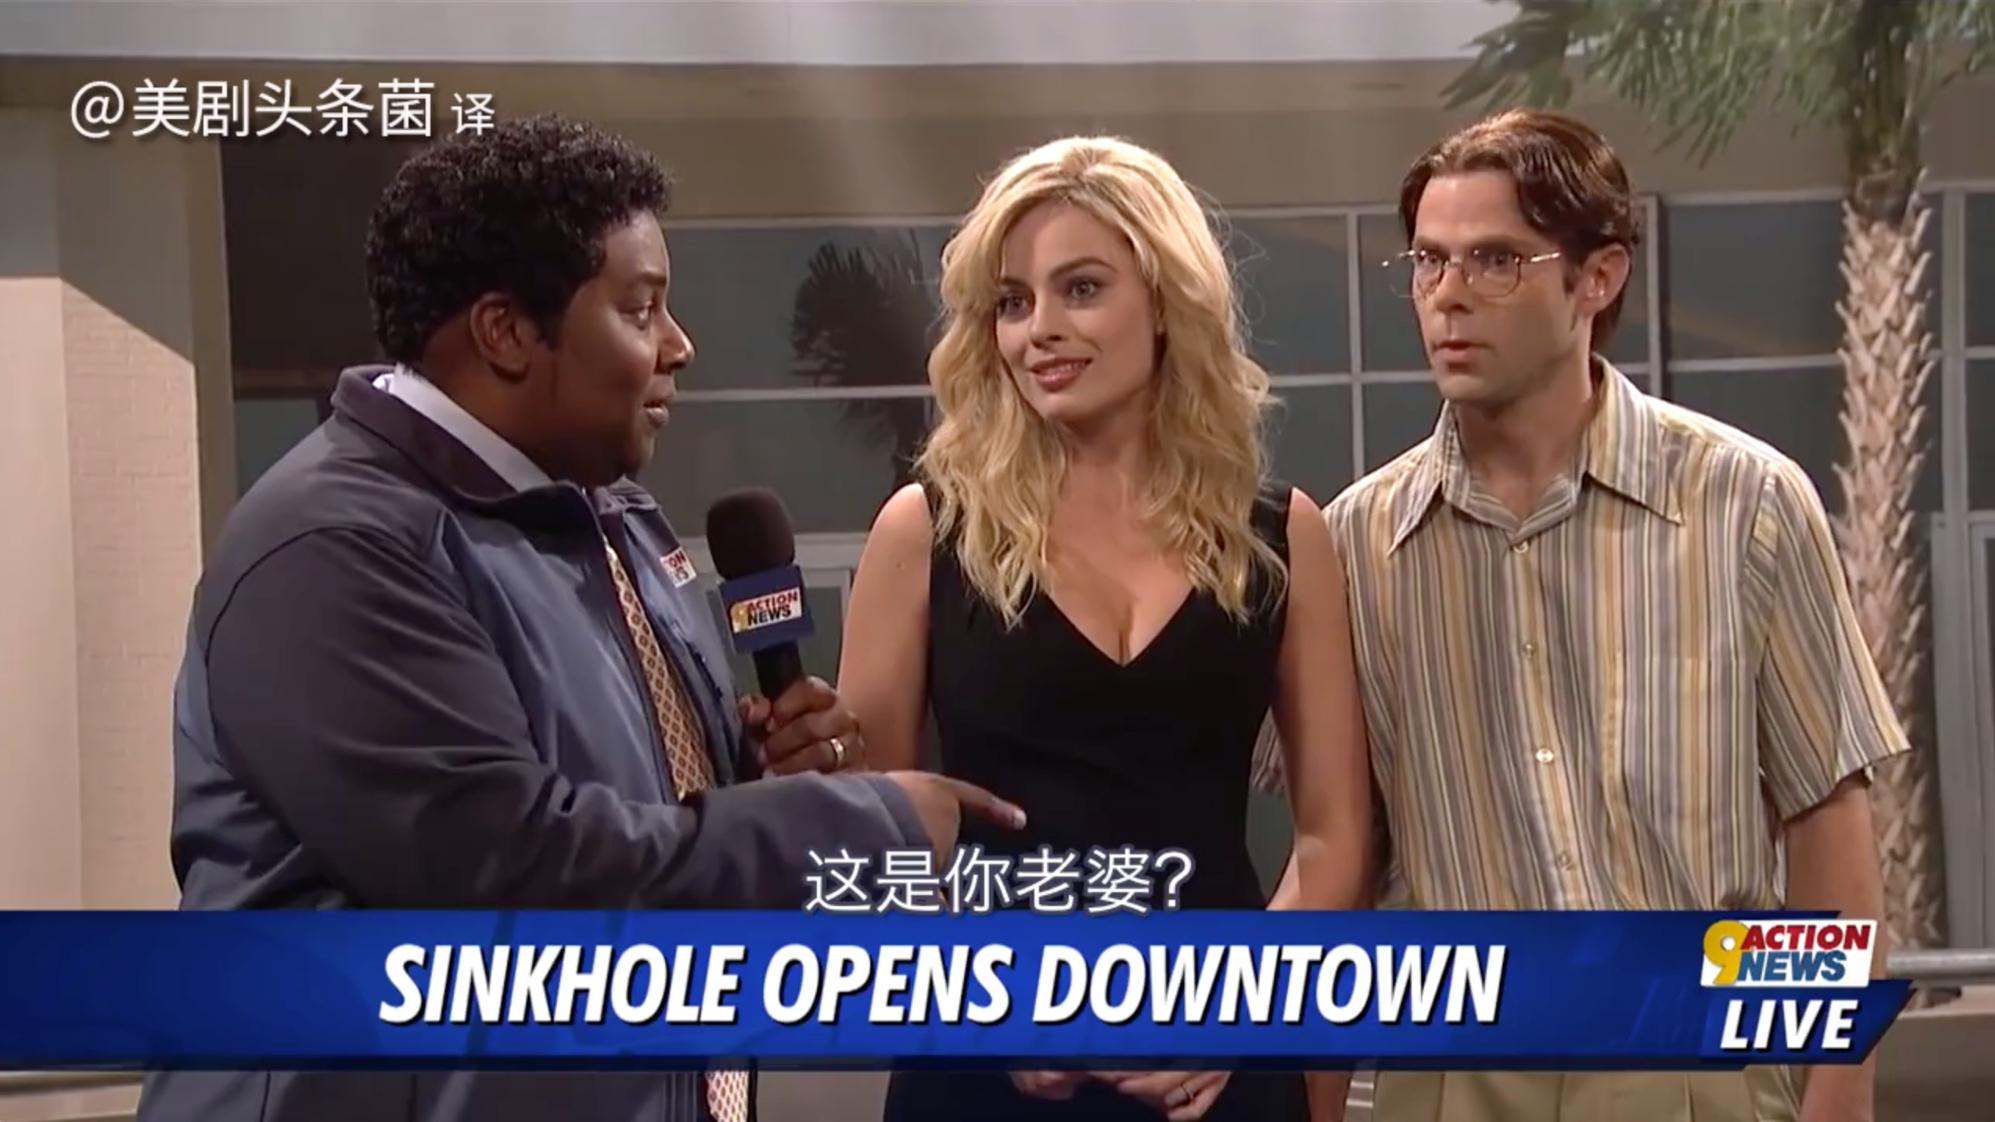 【SNL搞笑段子】真鲜花插牛粪!全员一脸懵逼!